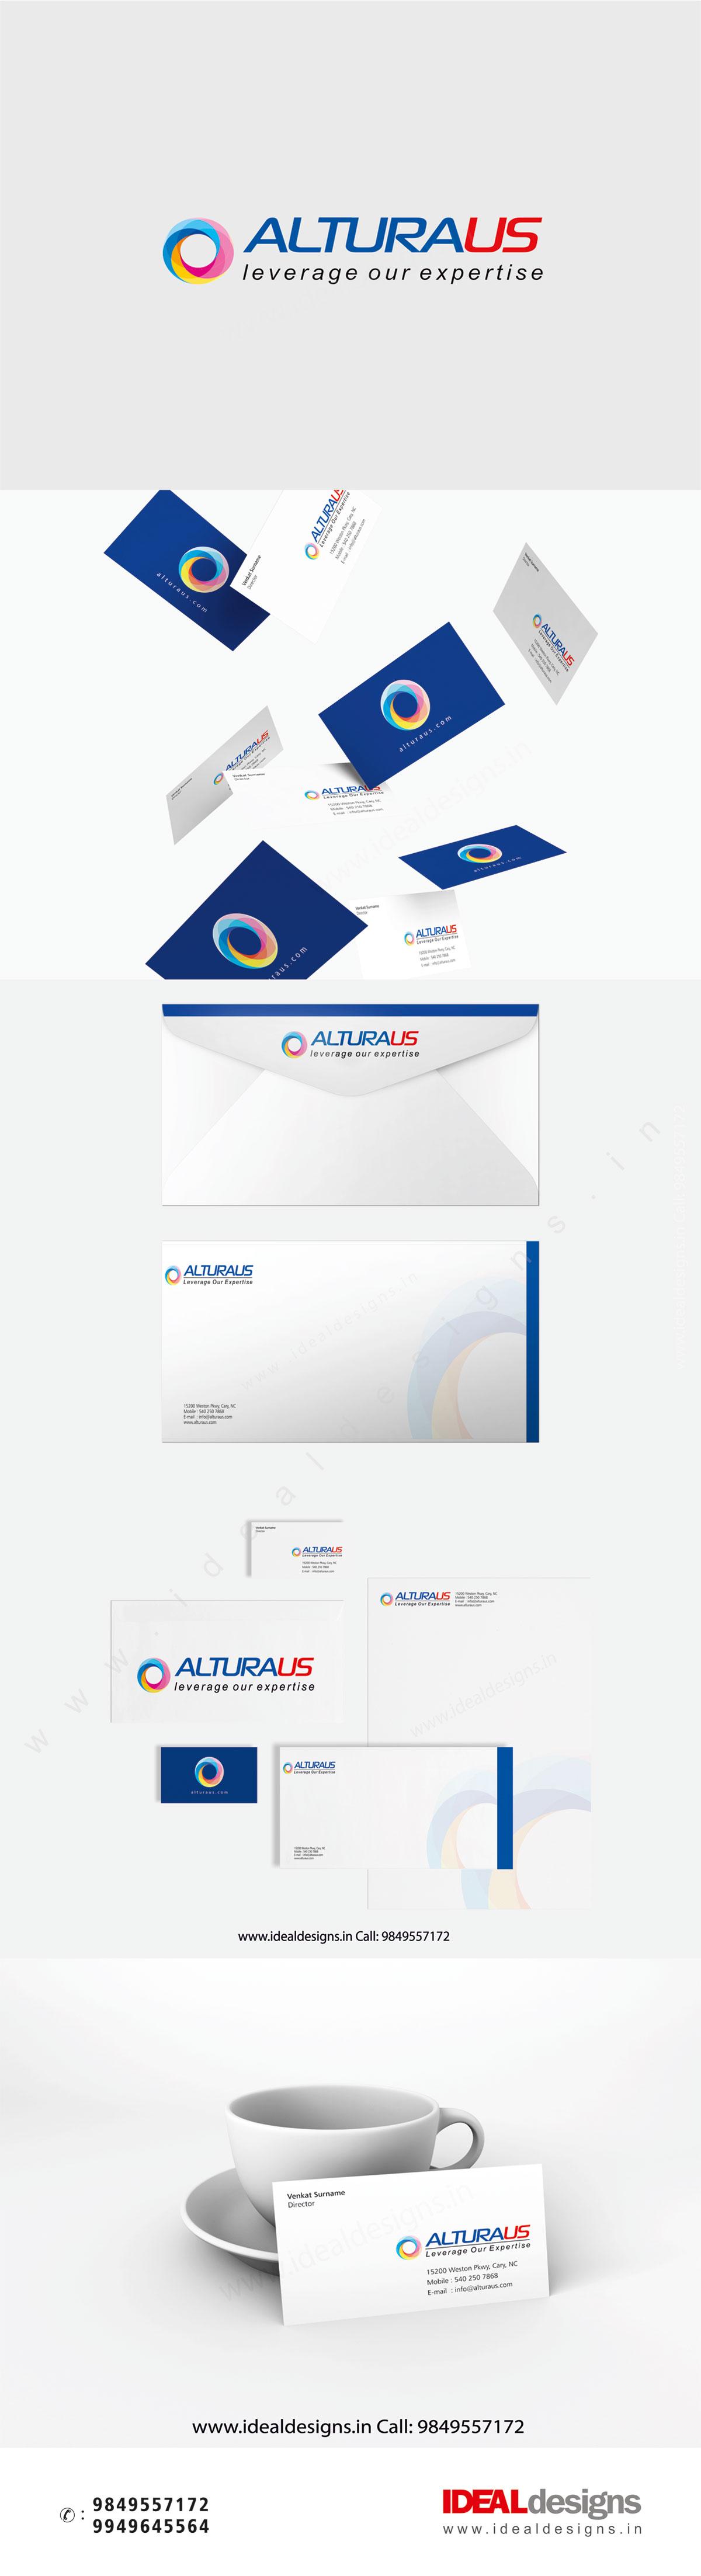 creative Professional Designers, Logo Design CompanyWeb Developers India, Web Designers India, Best Brochure Design Company Offers Brochure Design Services